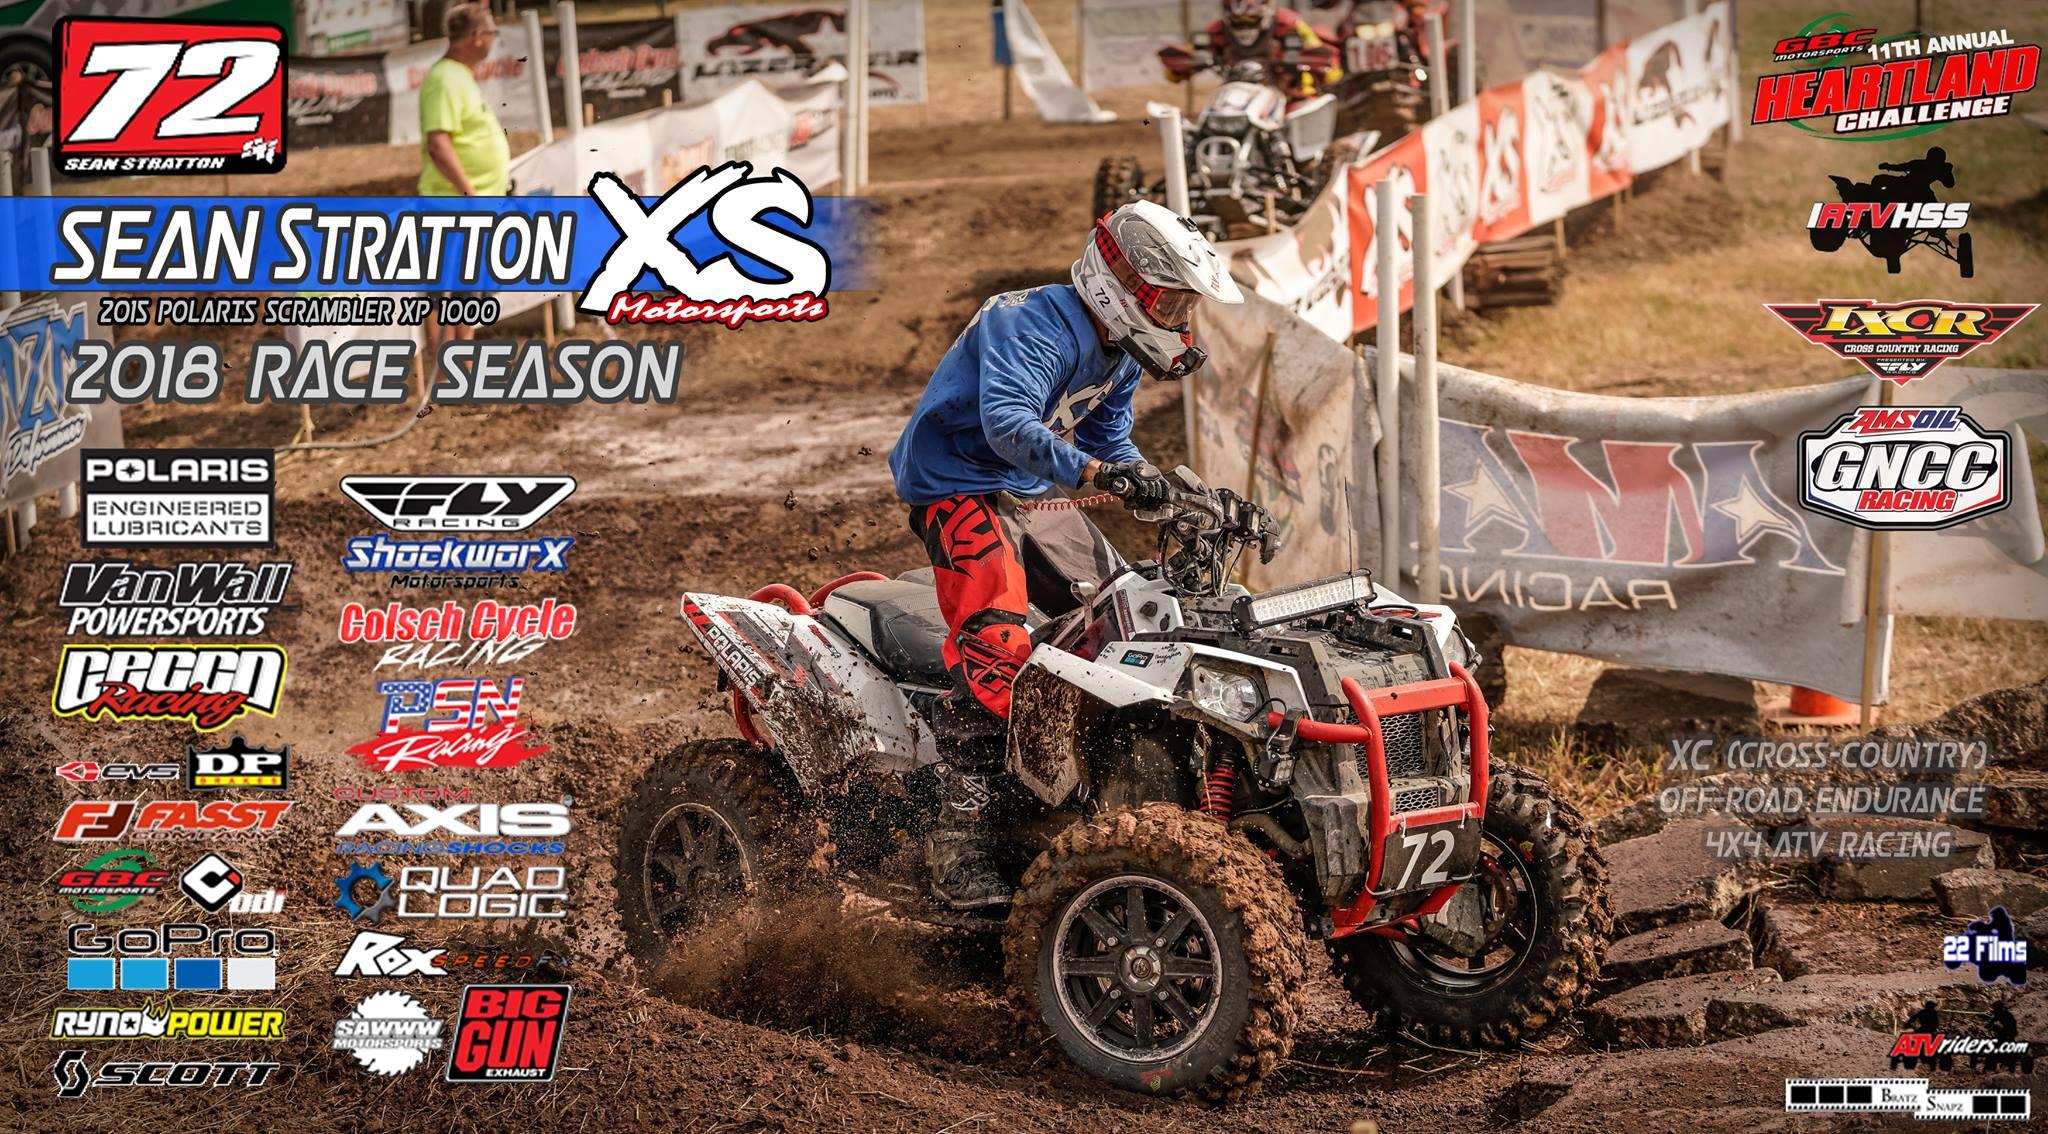 Sean Stratton 2018 4x4 ATV Racing